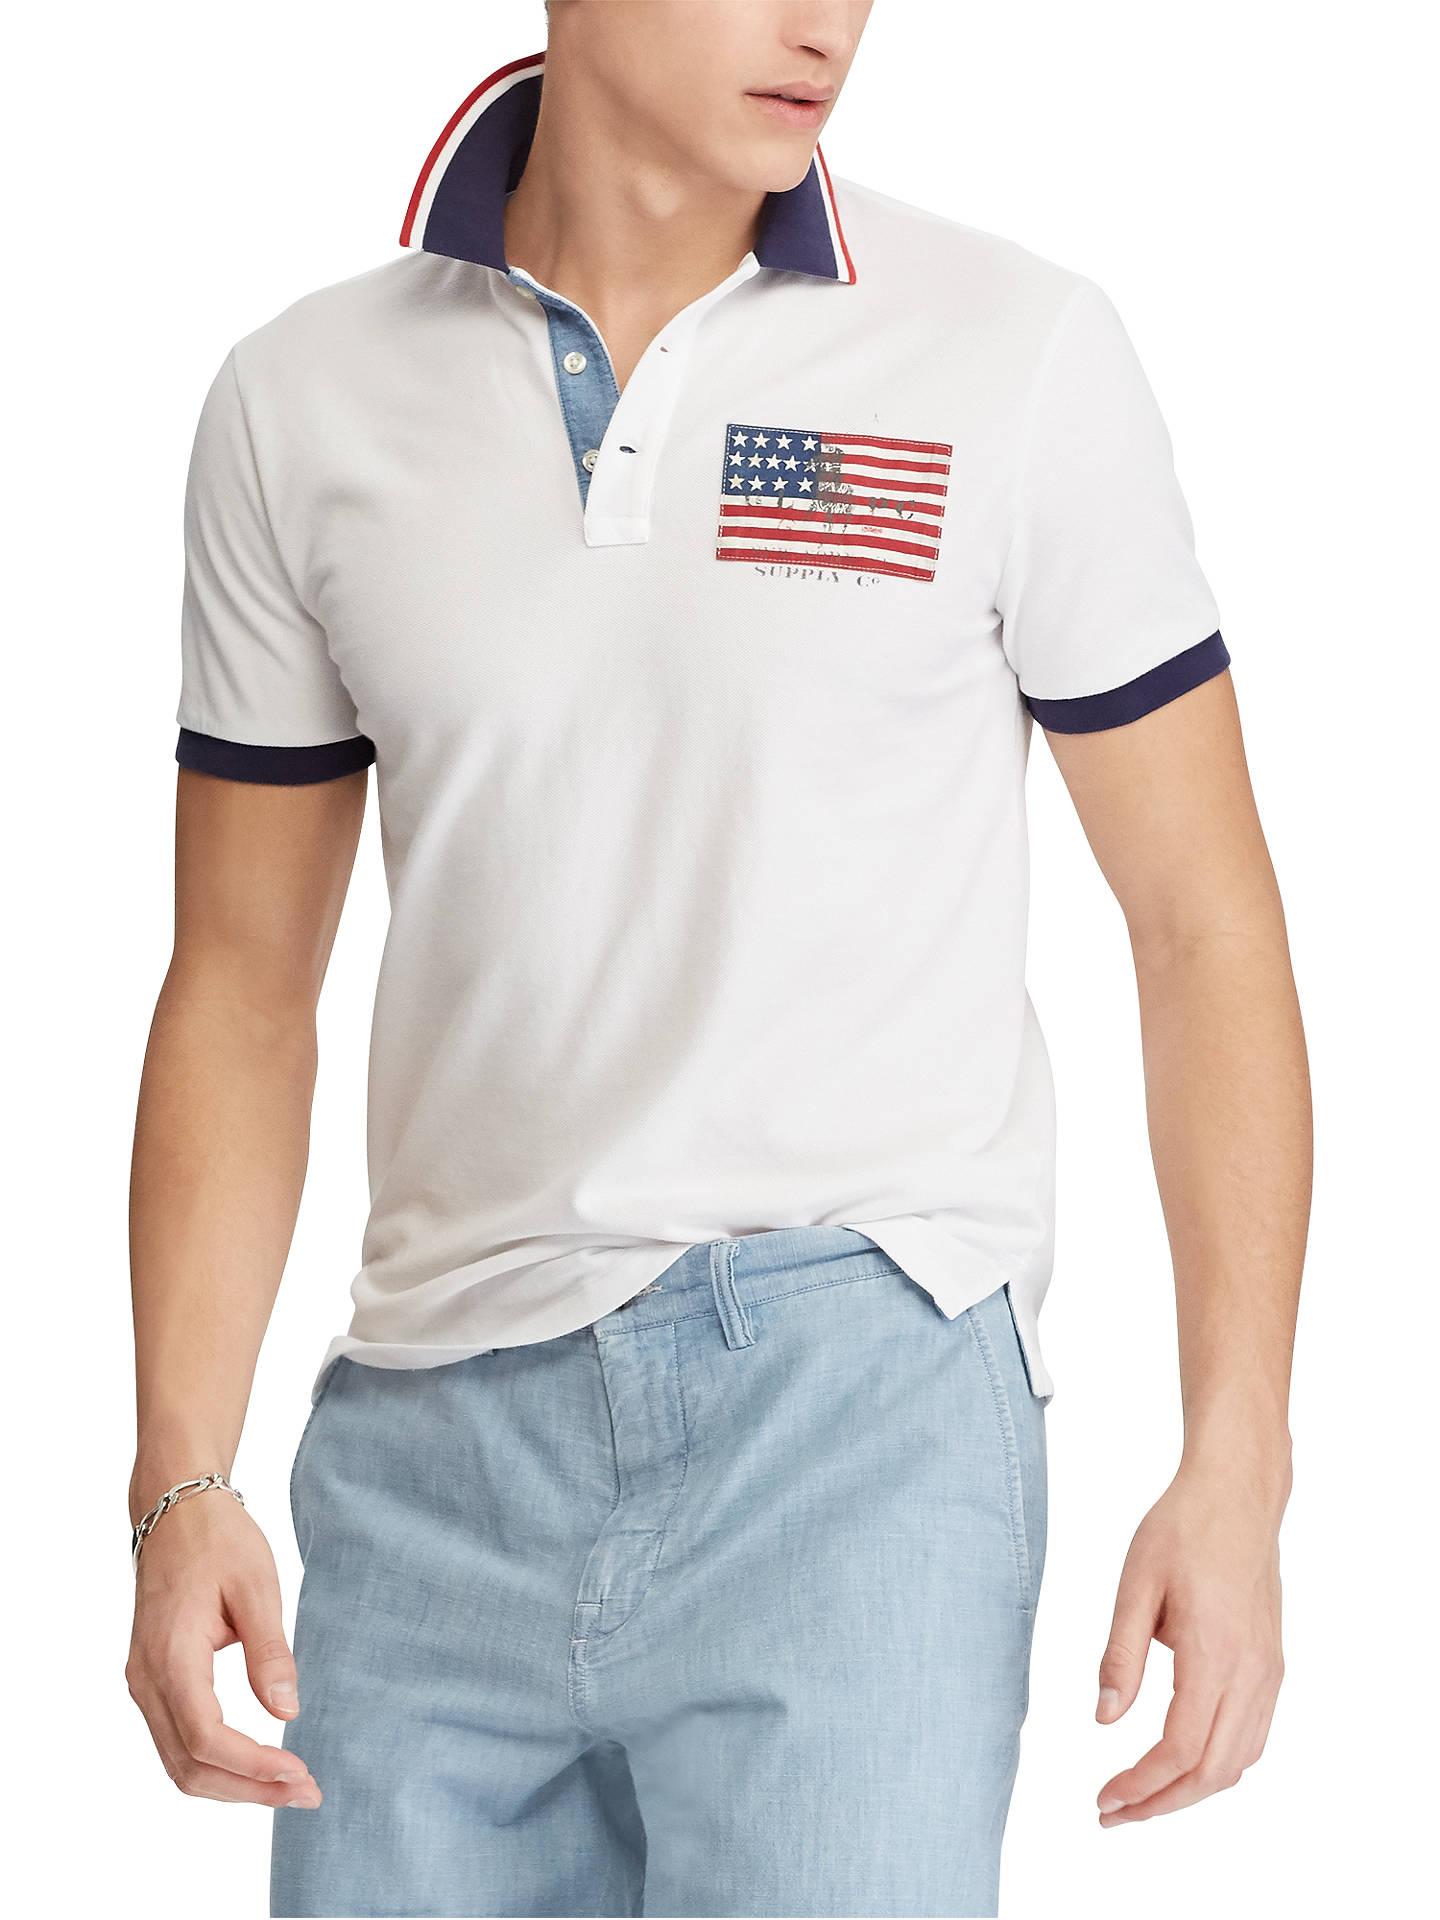 2b433d638aa4 Buy Polo Ralph Lauren American Flag Custom Fit Polo Shirt